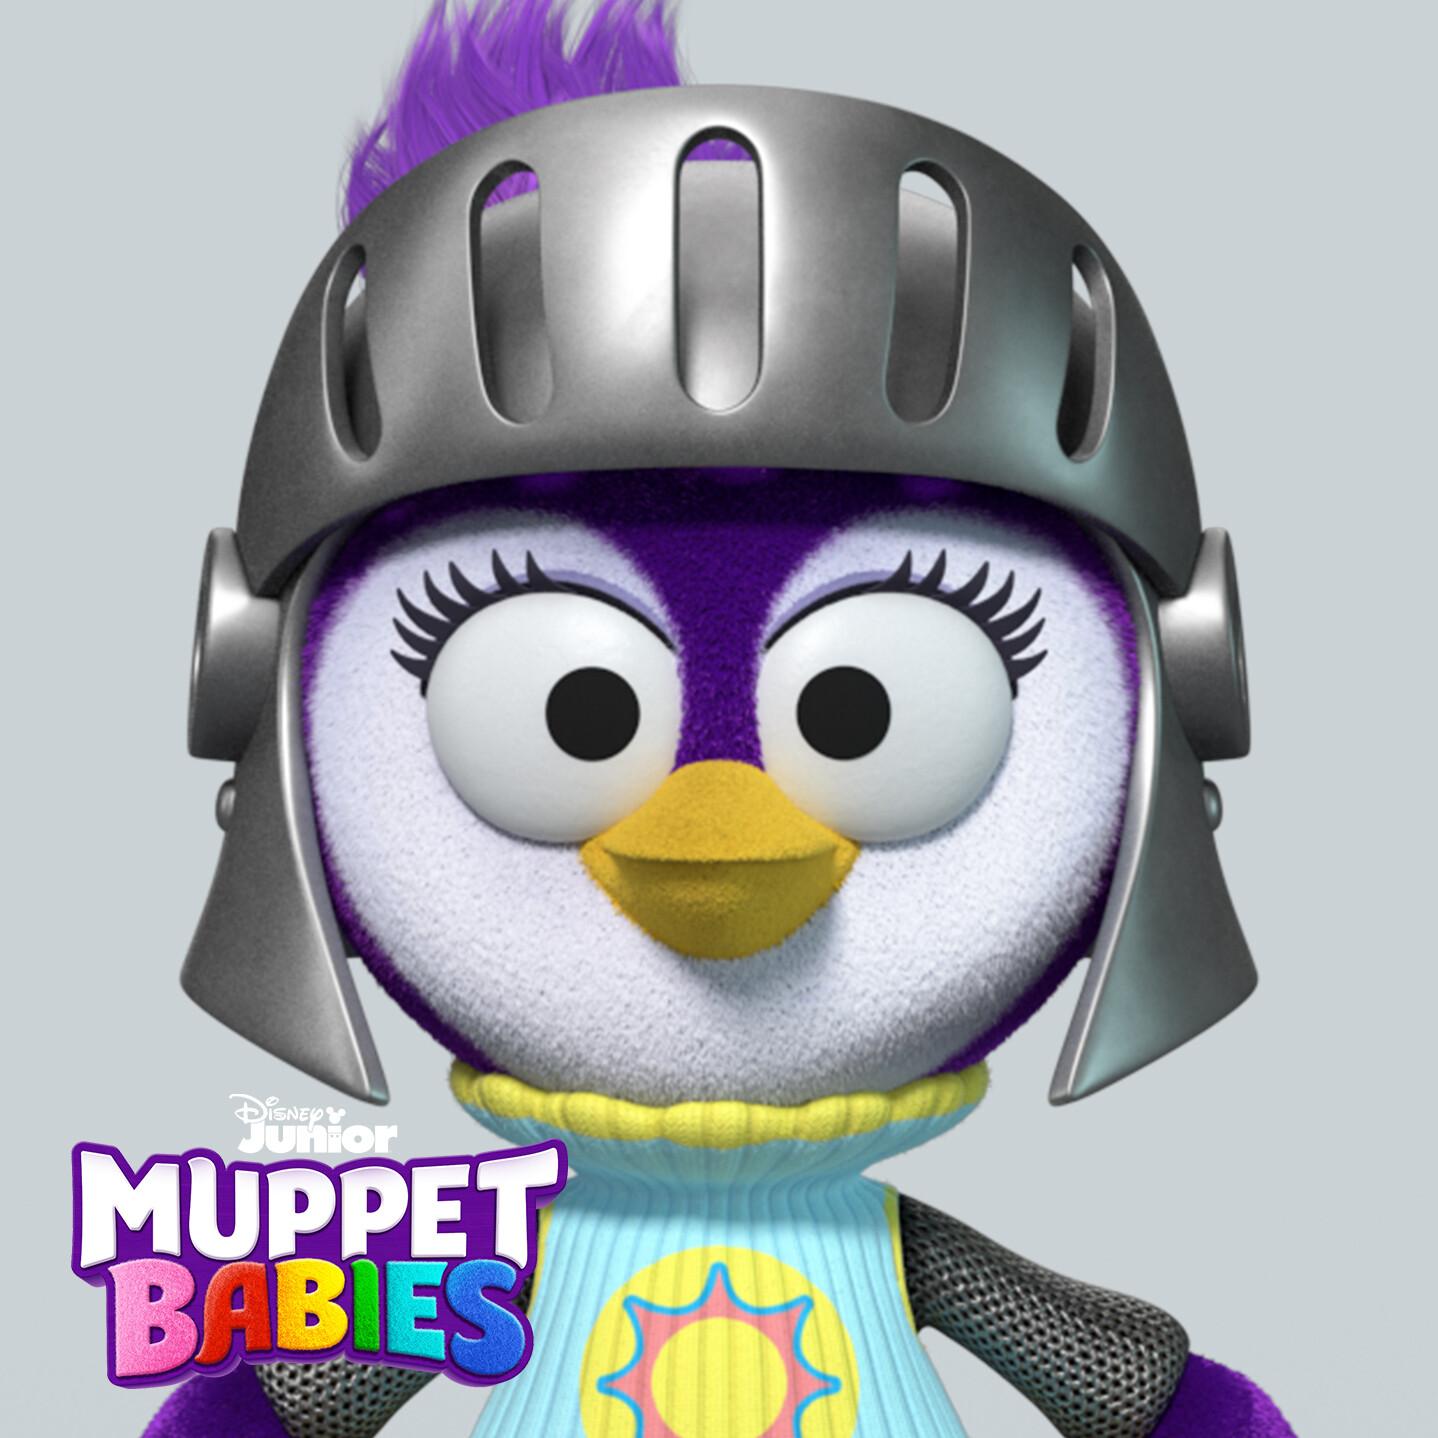 Muppet Babies - Character Variants